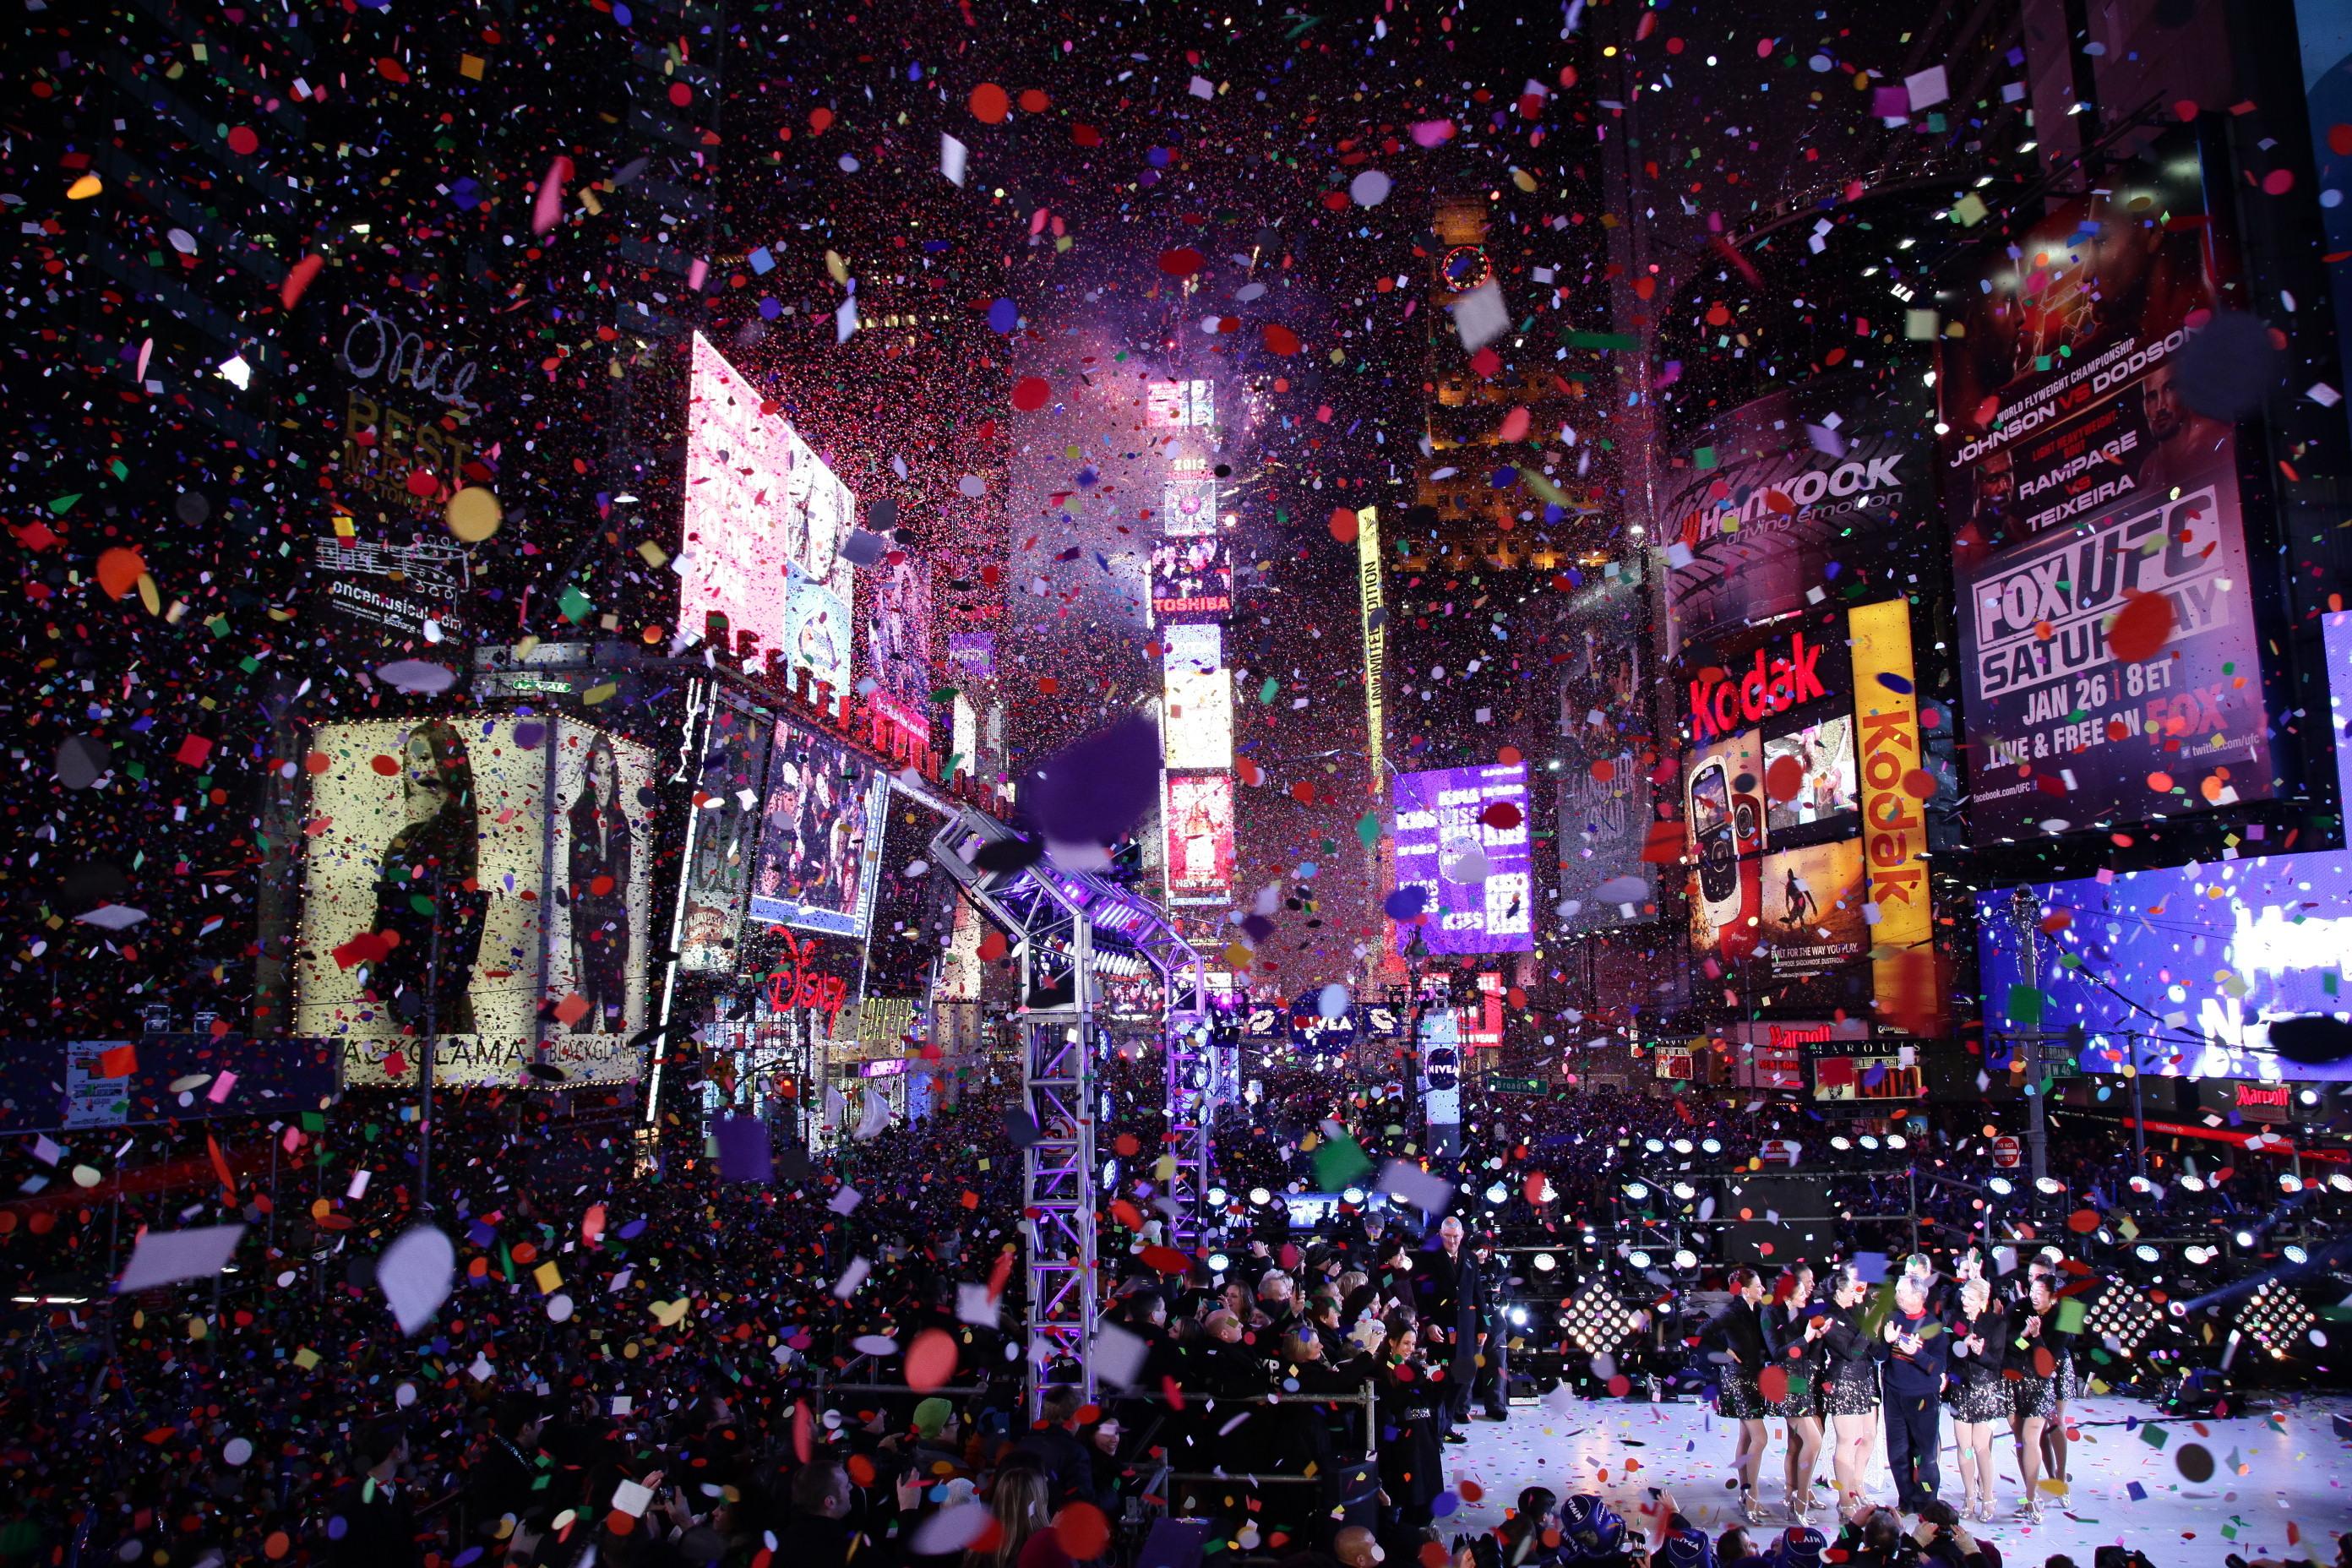 New Year's Eve Hullabaloo!